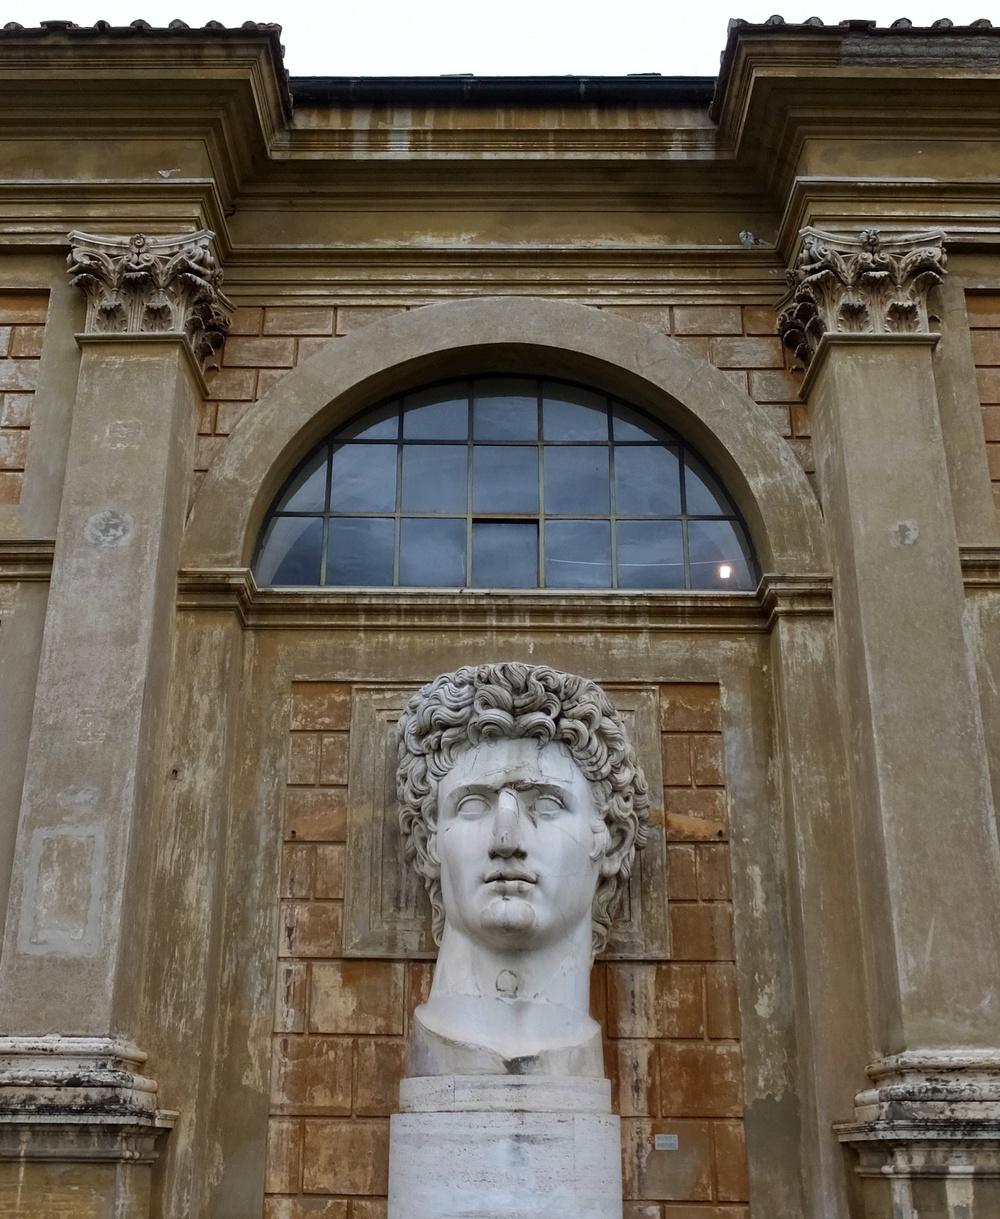 CRO Italy web 2013 - 048.jpg